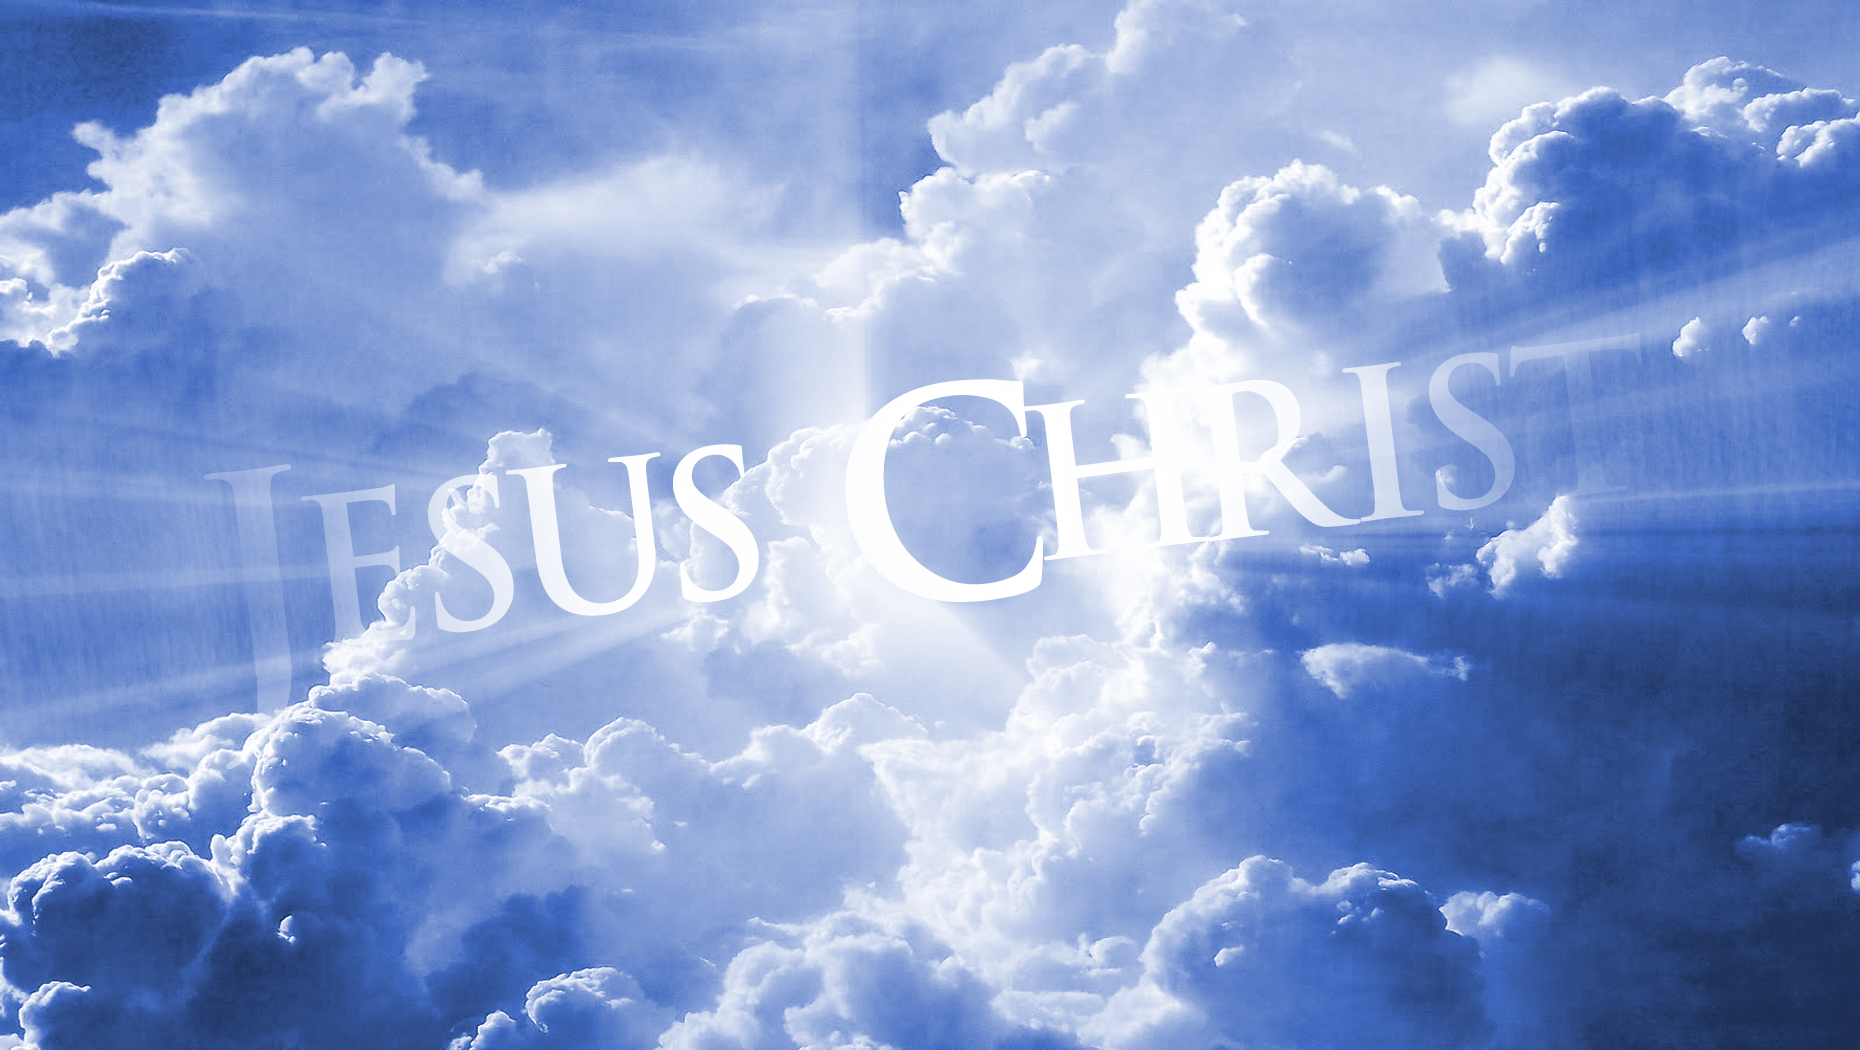 Jesus Christ Sky Hd Wallpaper